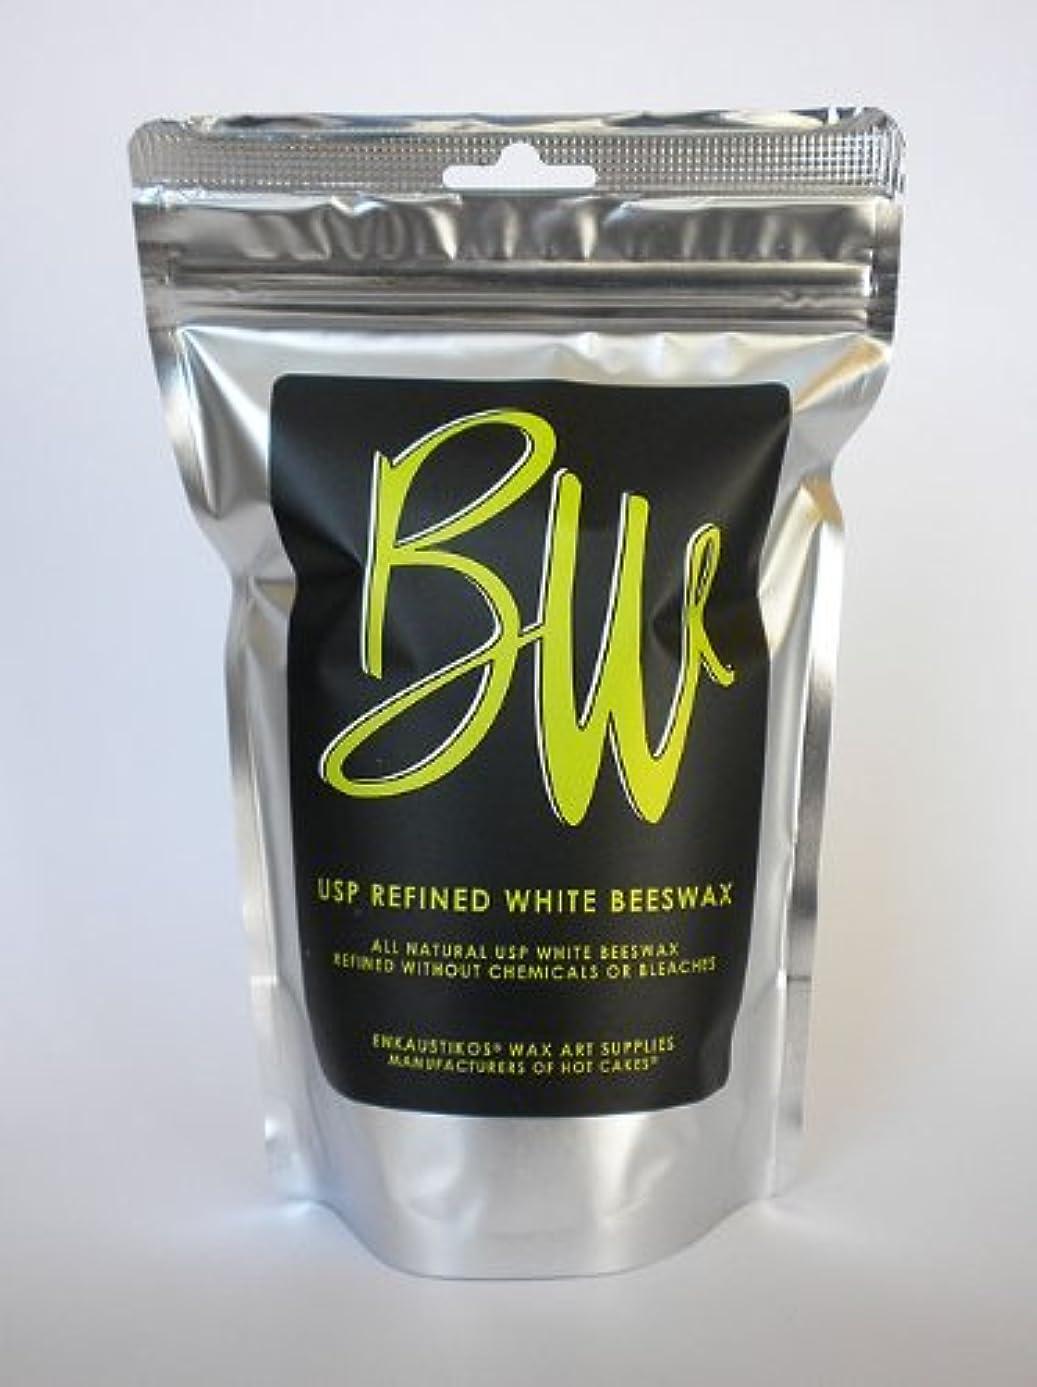 Beeswax US Pharmaceutical Grade White 16 oz Resealable Bag by Enkaustikos